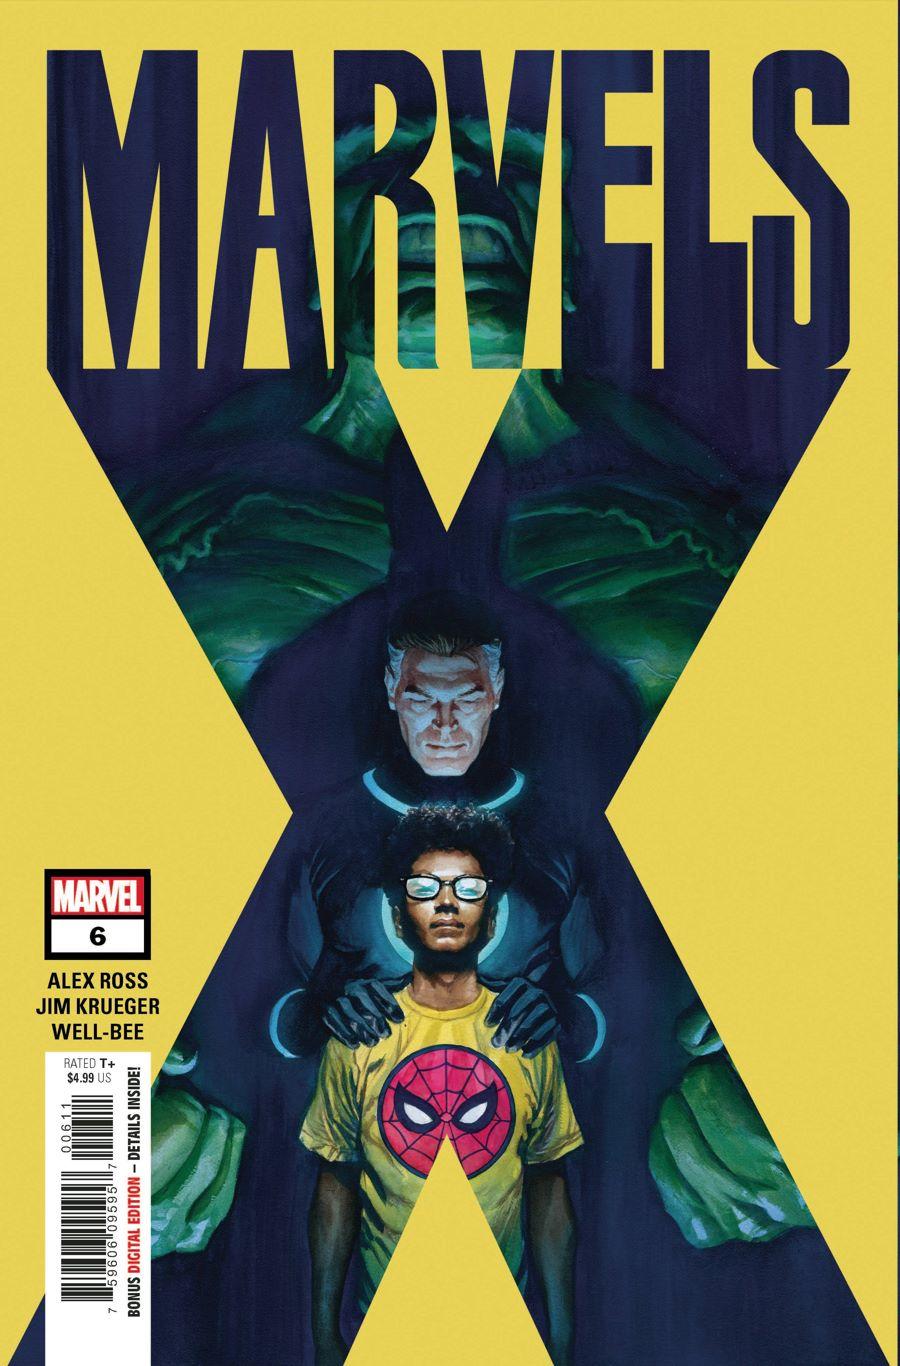 STL157176-1 ComicList: Marvel Comics New Releases for 10/21/2020